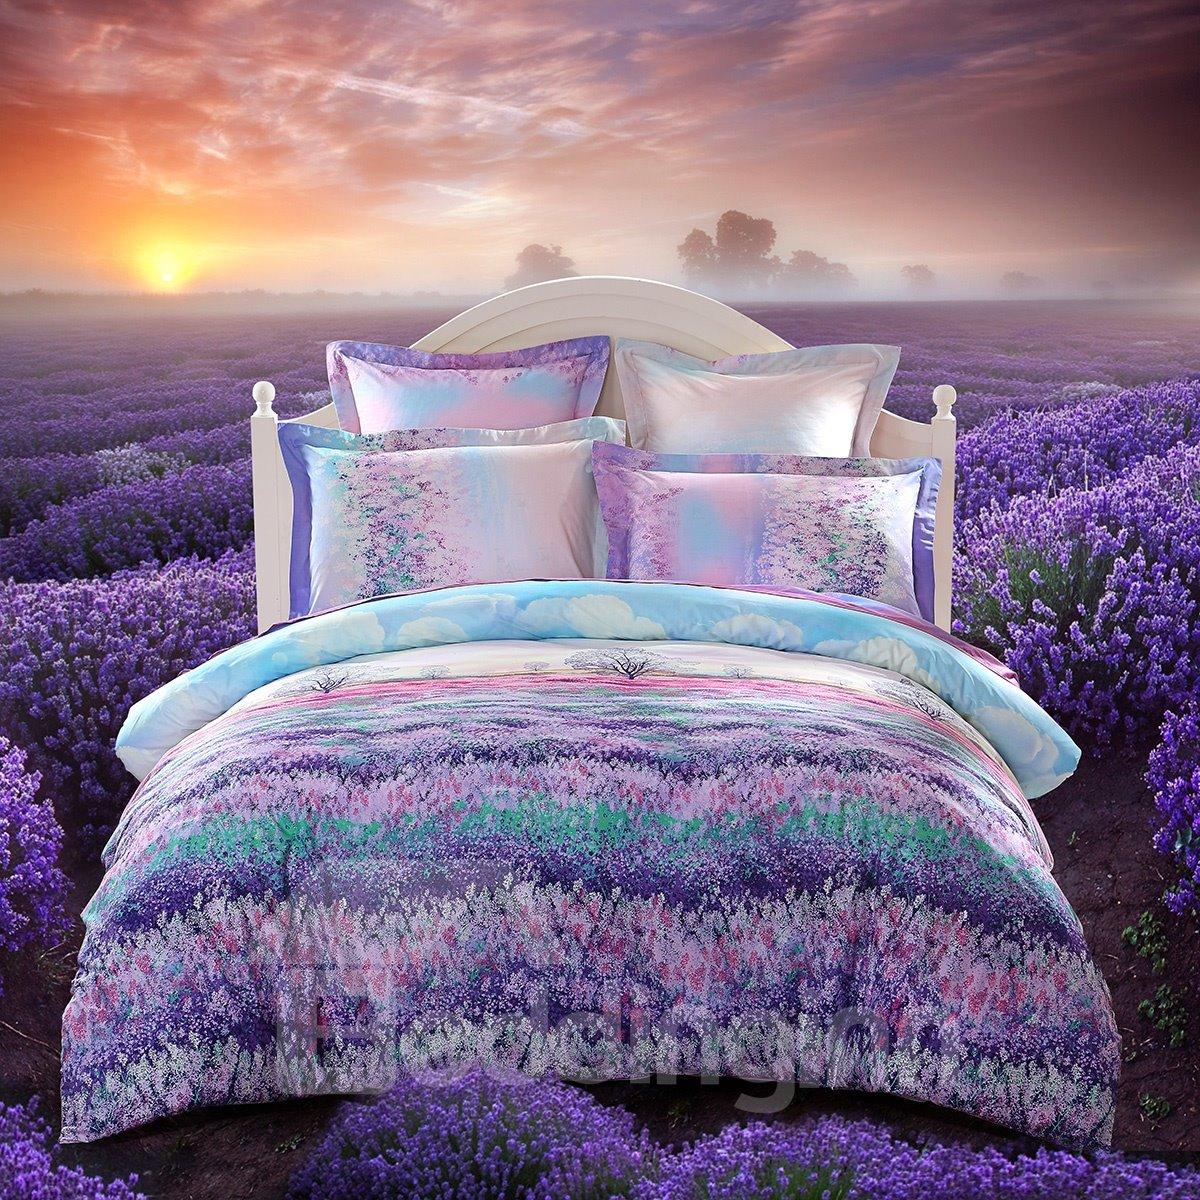 Lavender floral bedding -  Beautiful Lavender Garden Printing 3 Piece Cotton Duvet Cover Set